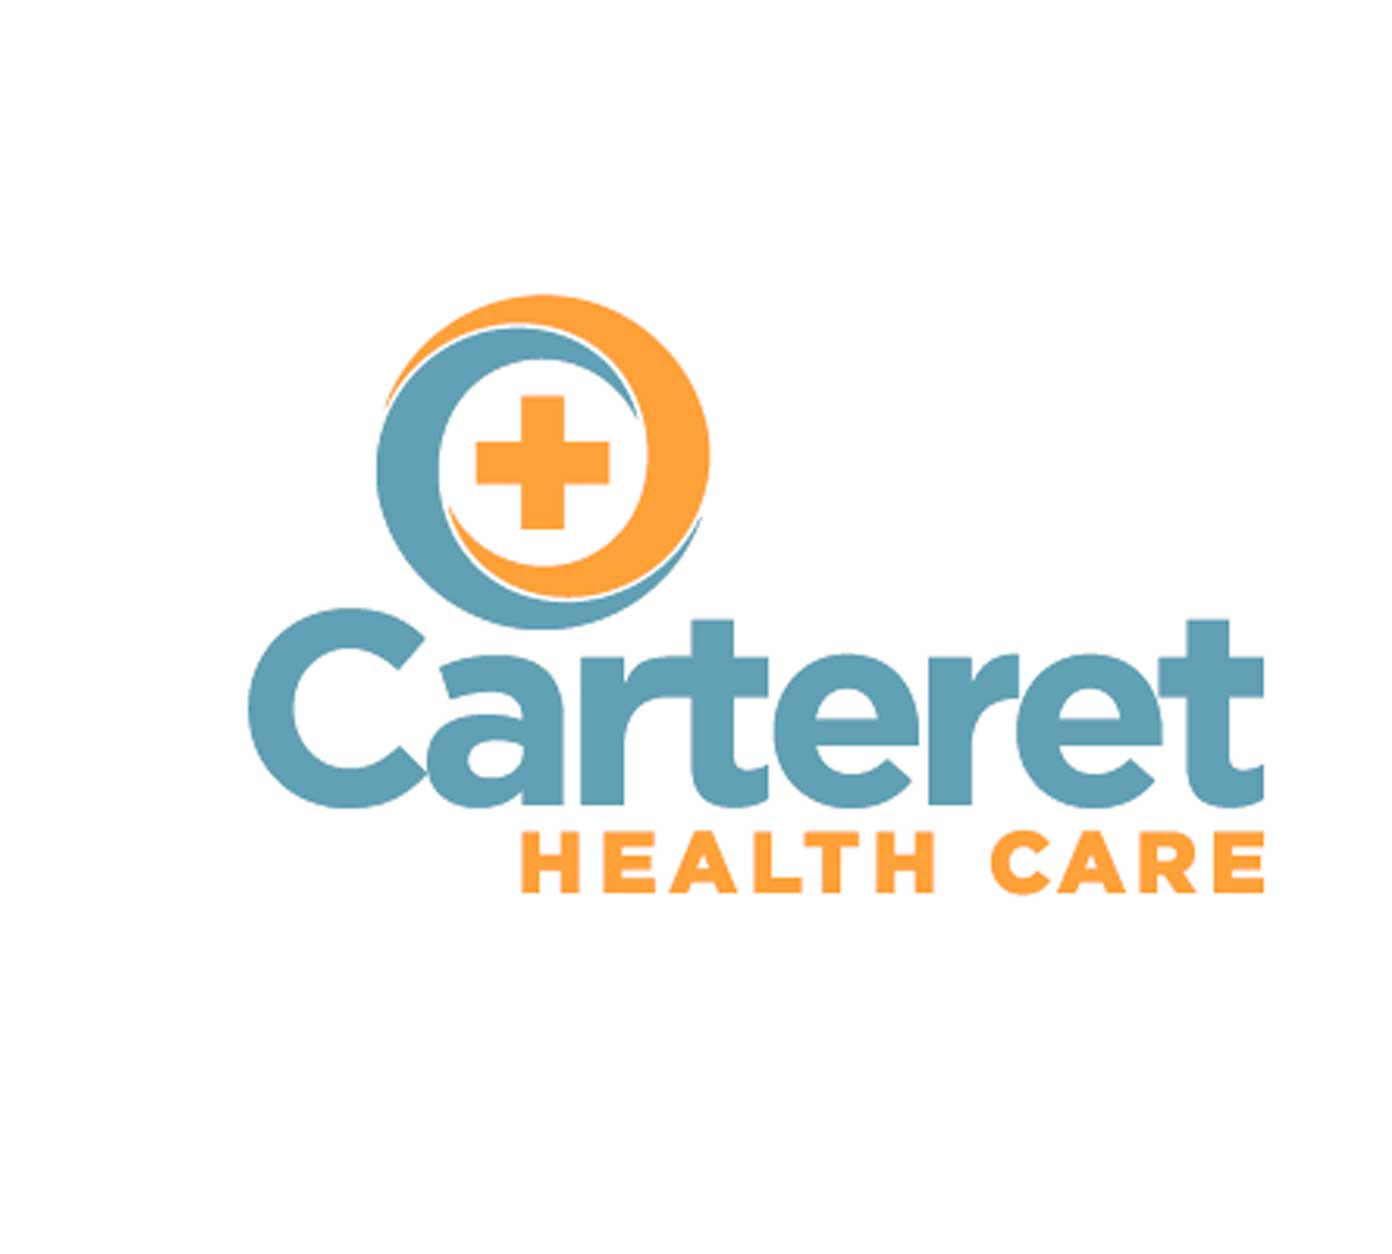 carteret-health-care.